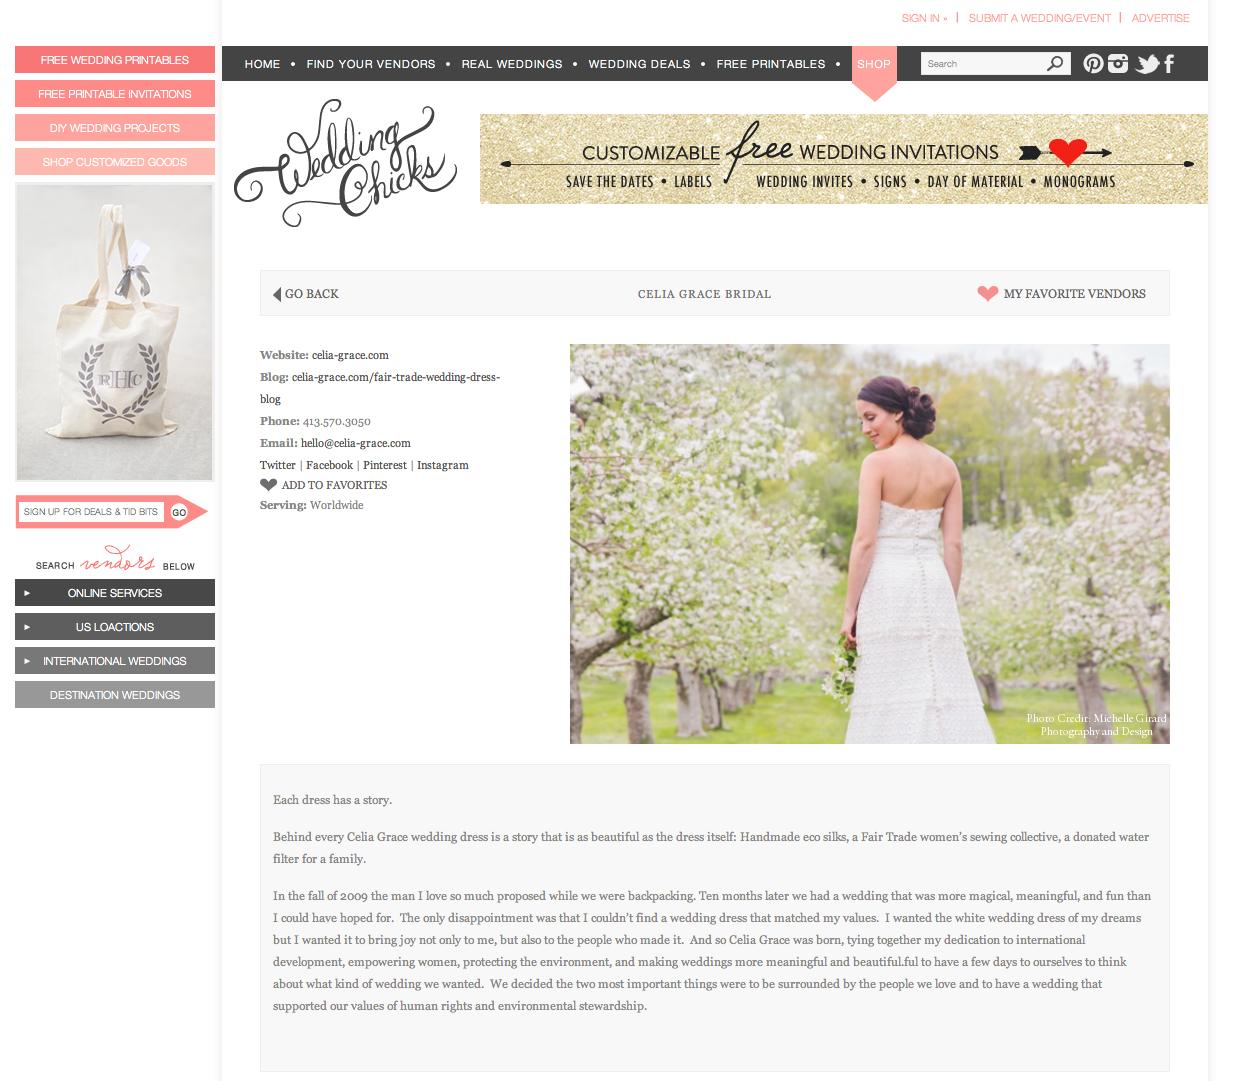 weddingchicks_celiagrace.jpg